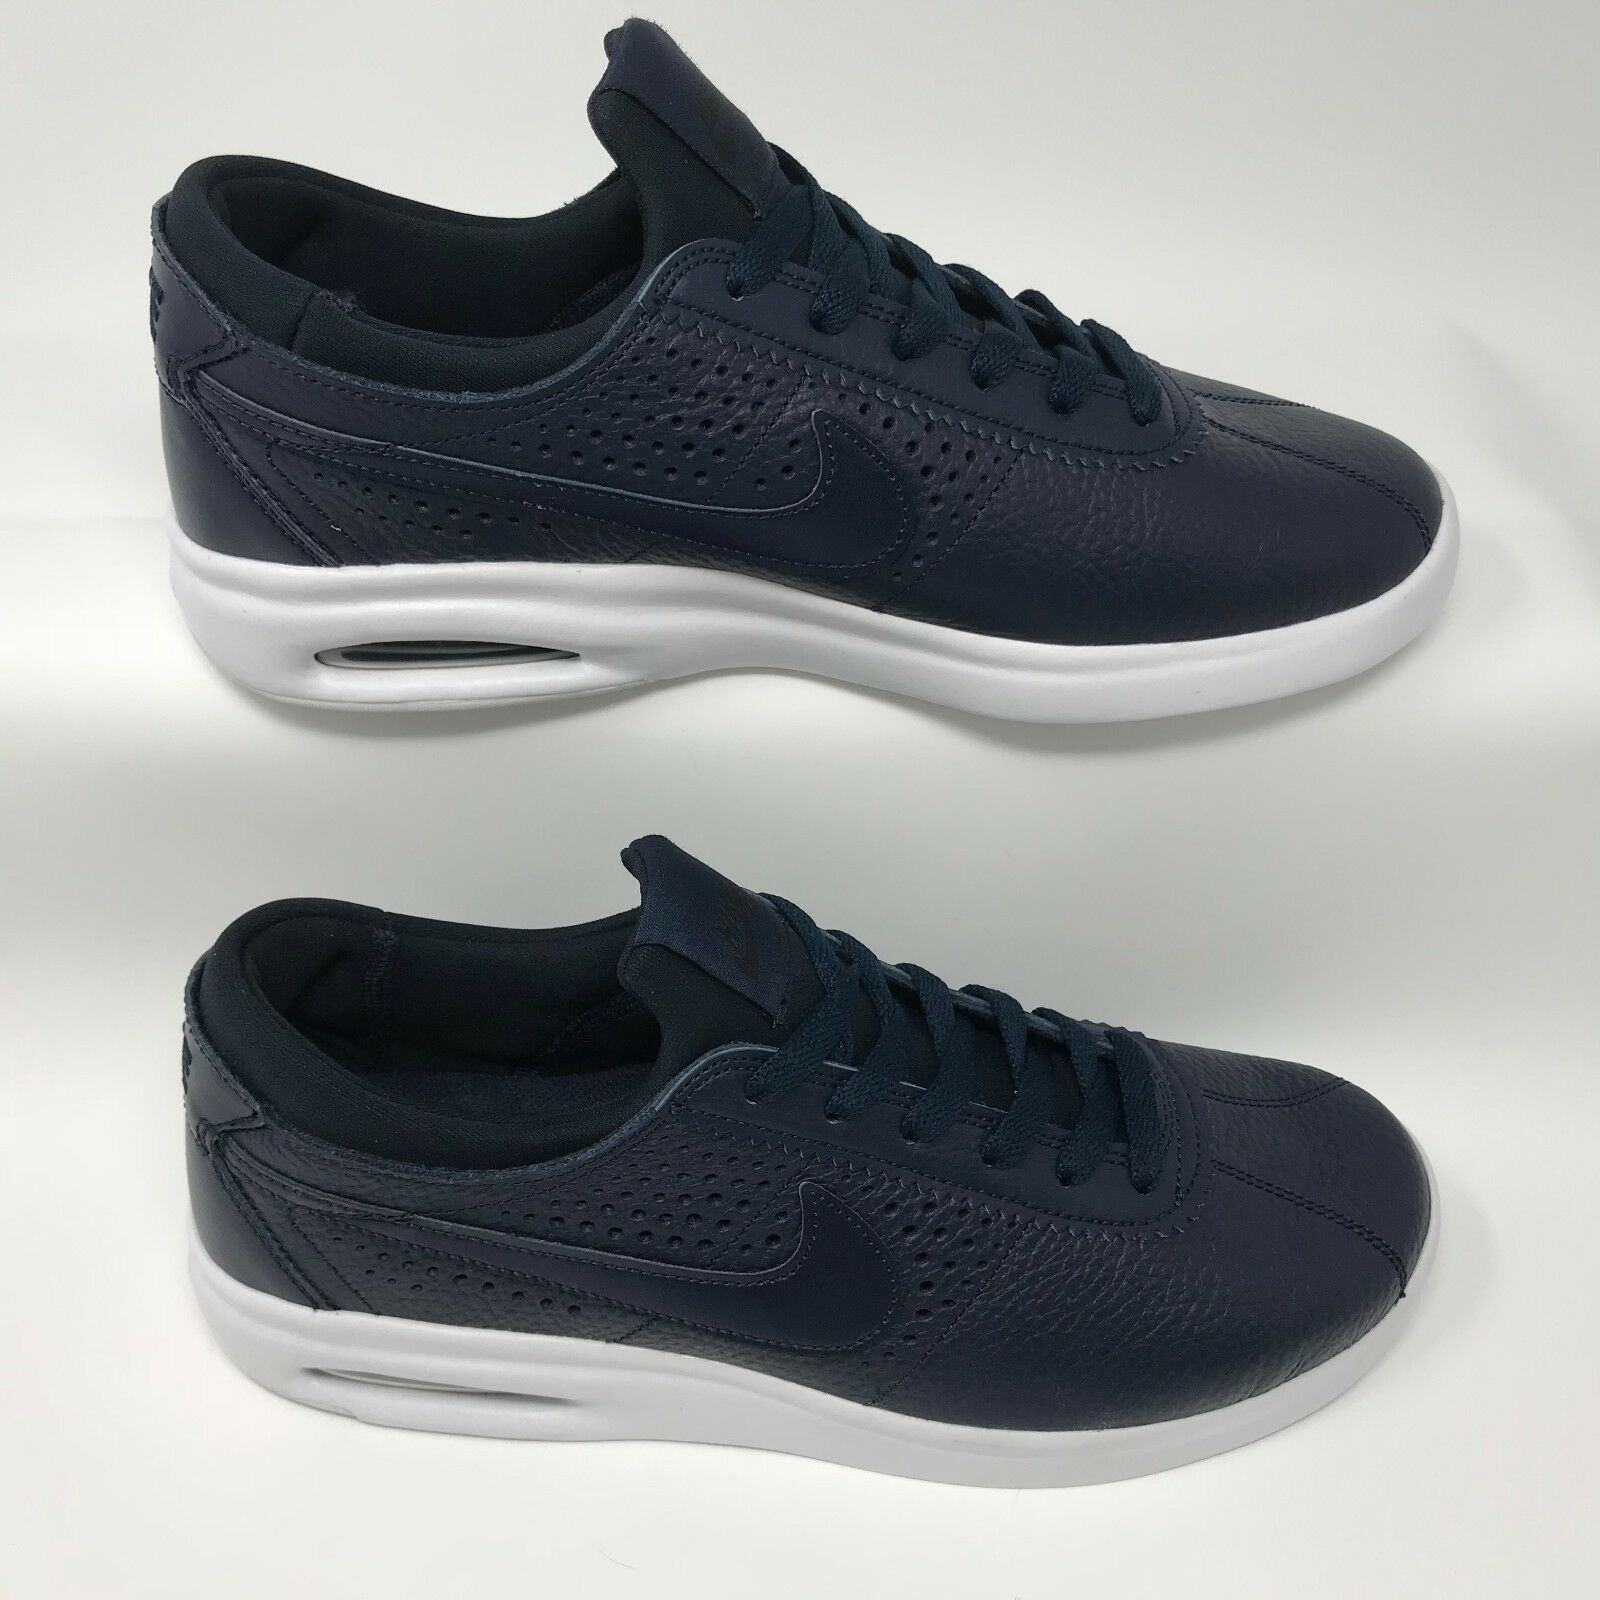 Nike 923111-440 Men's SB Bruin Max Vapor Skate Shoe Navy Leather Size 9